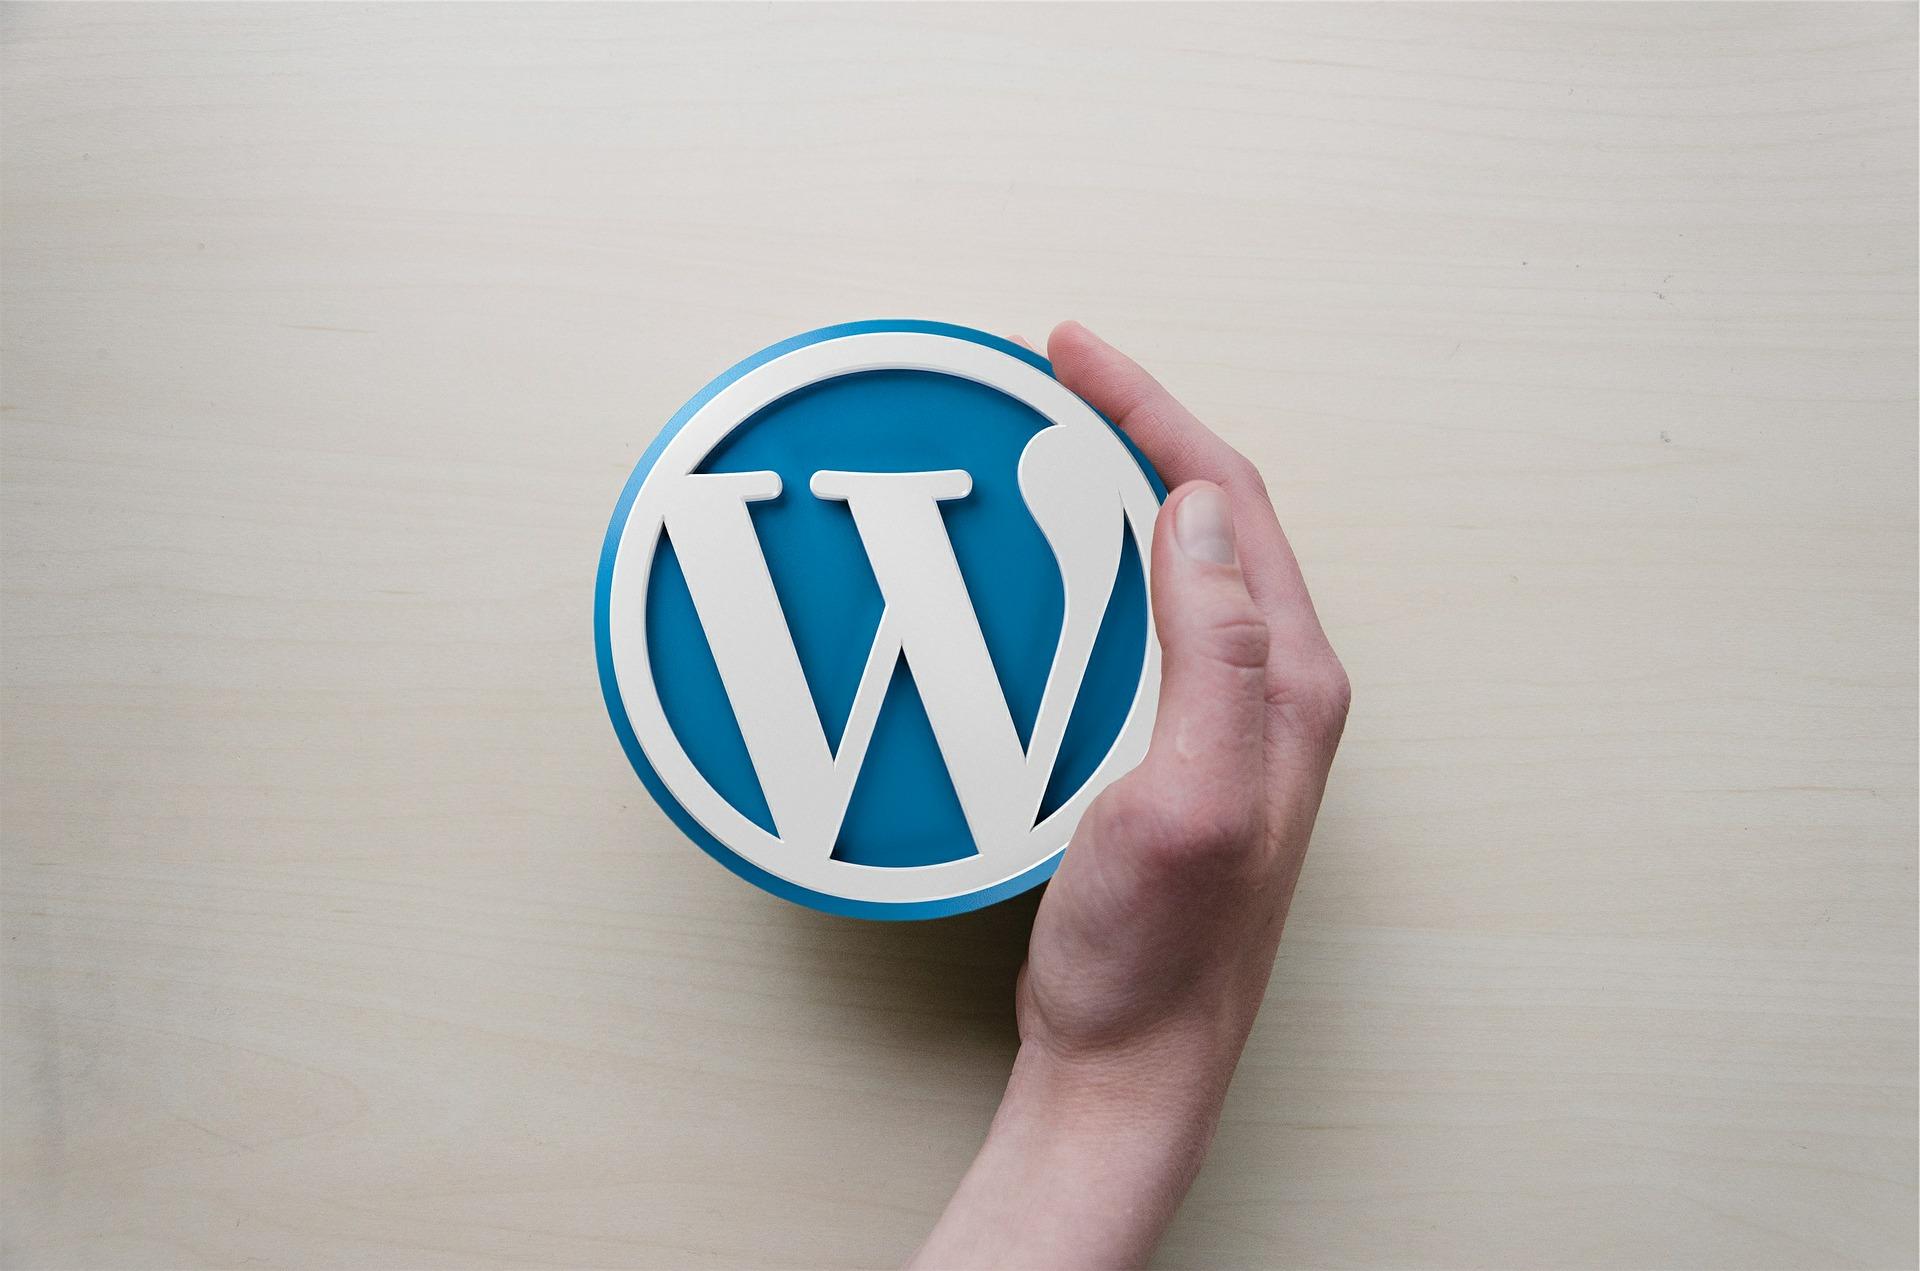 WordPressのサーバー移行方法とおすすめレンタルサーバー